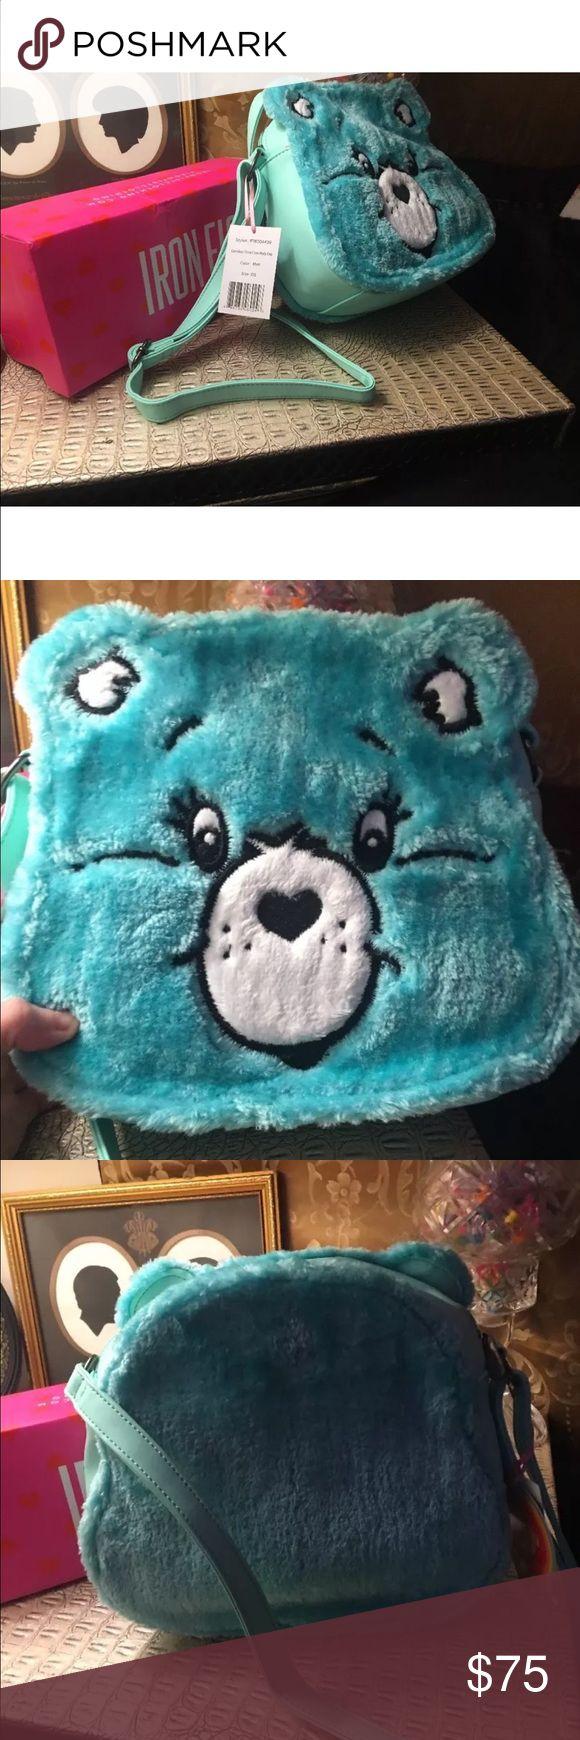 Iron fist care bear mint green handbag crossover Iron fist care bear mint green crossover purse new with tags no box Iron Fist Bags Crossbody Bags